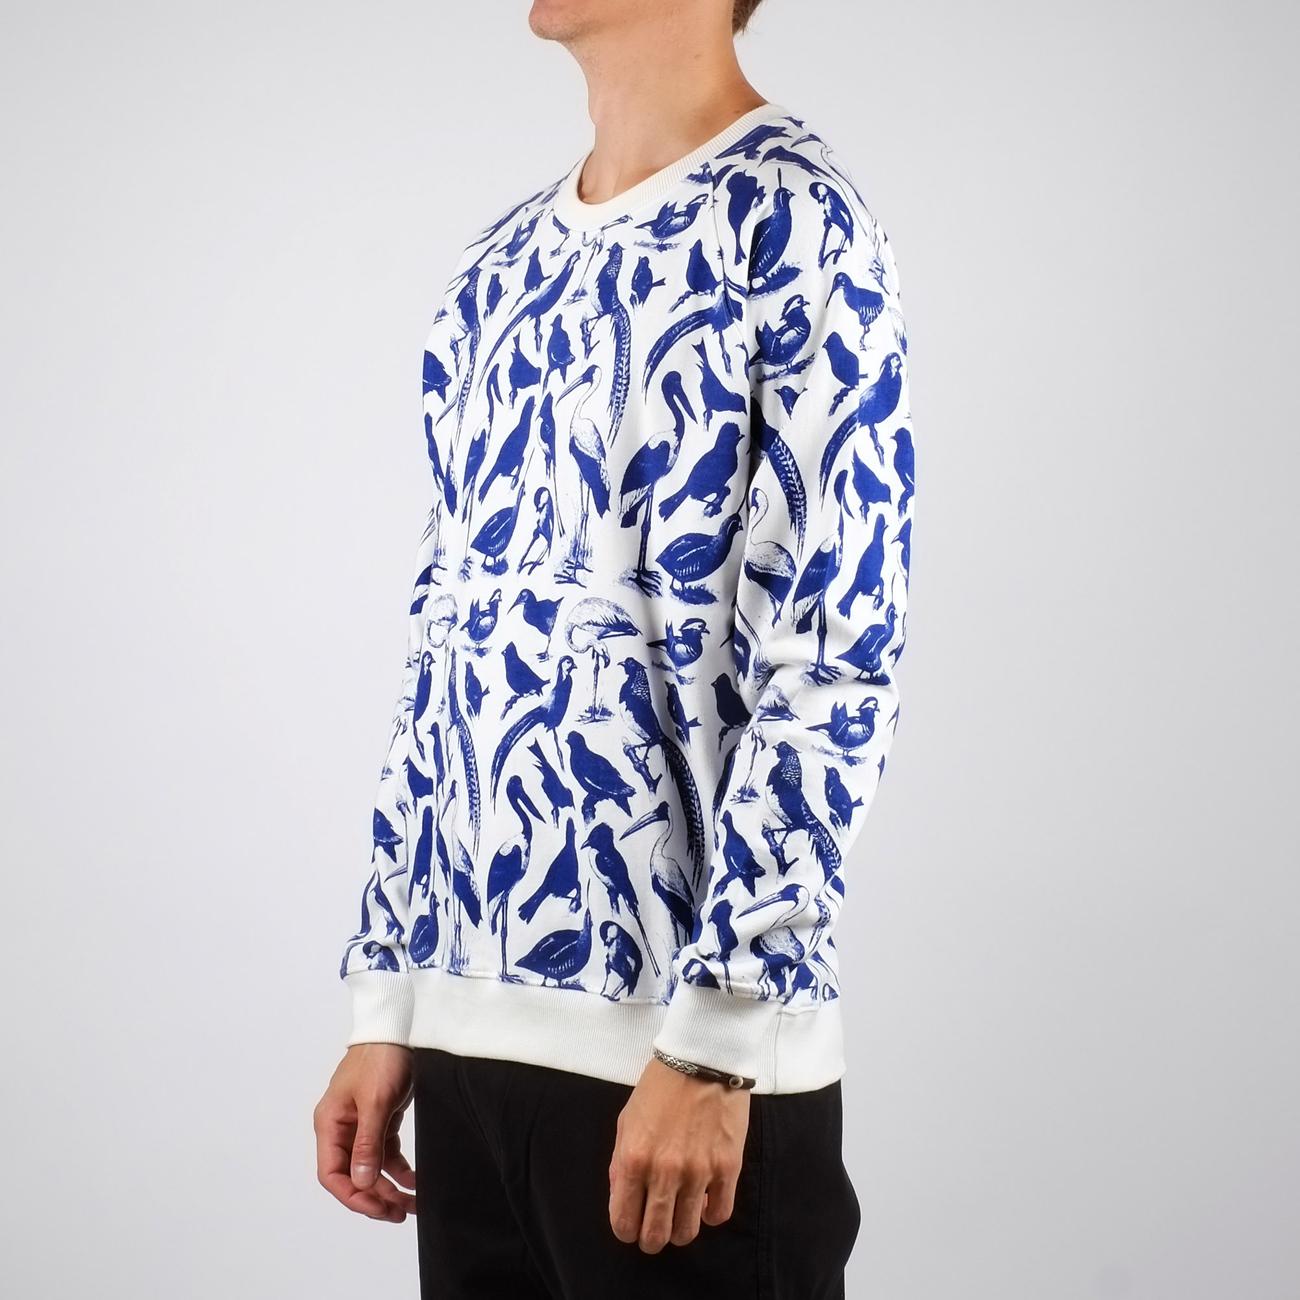 Sweatshirt Malmoe Blue Birds